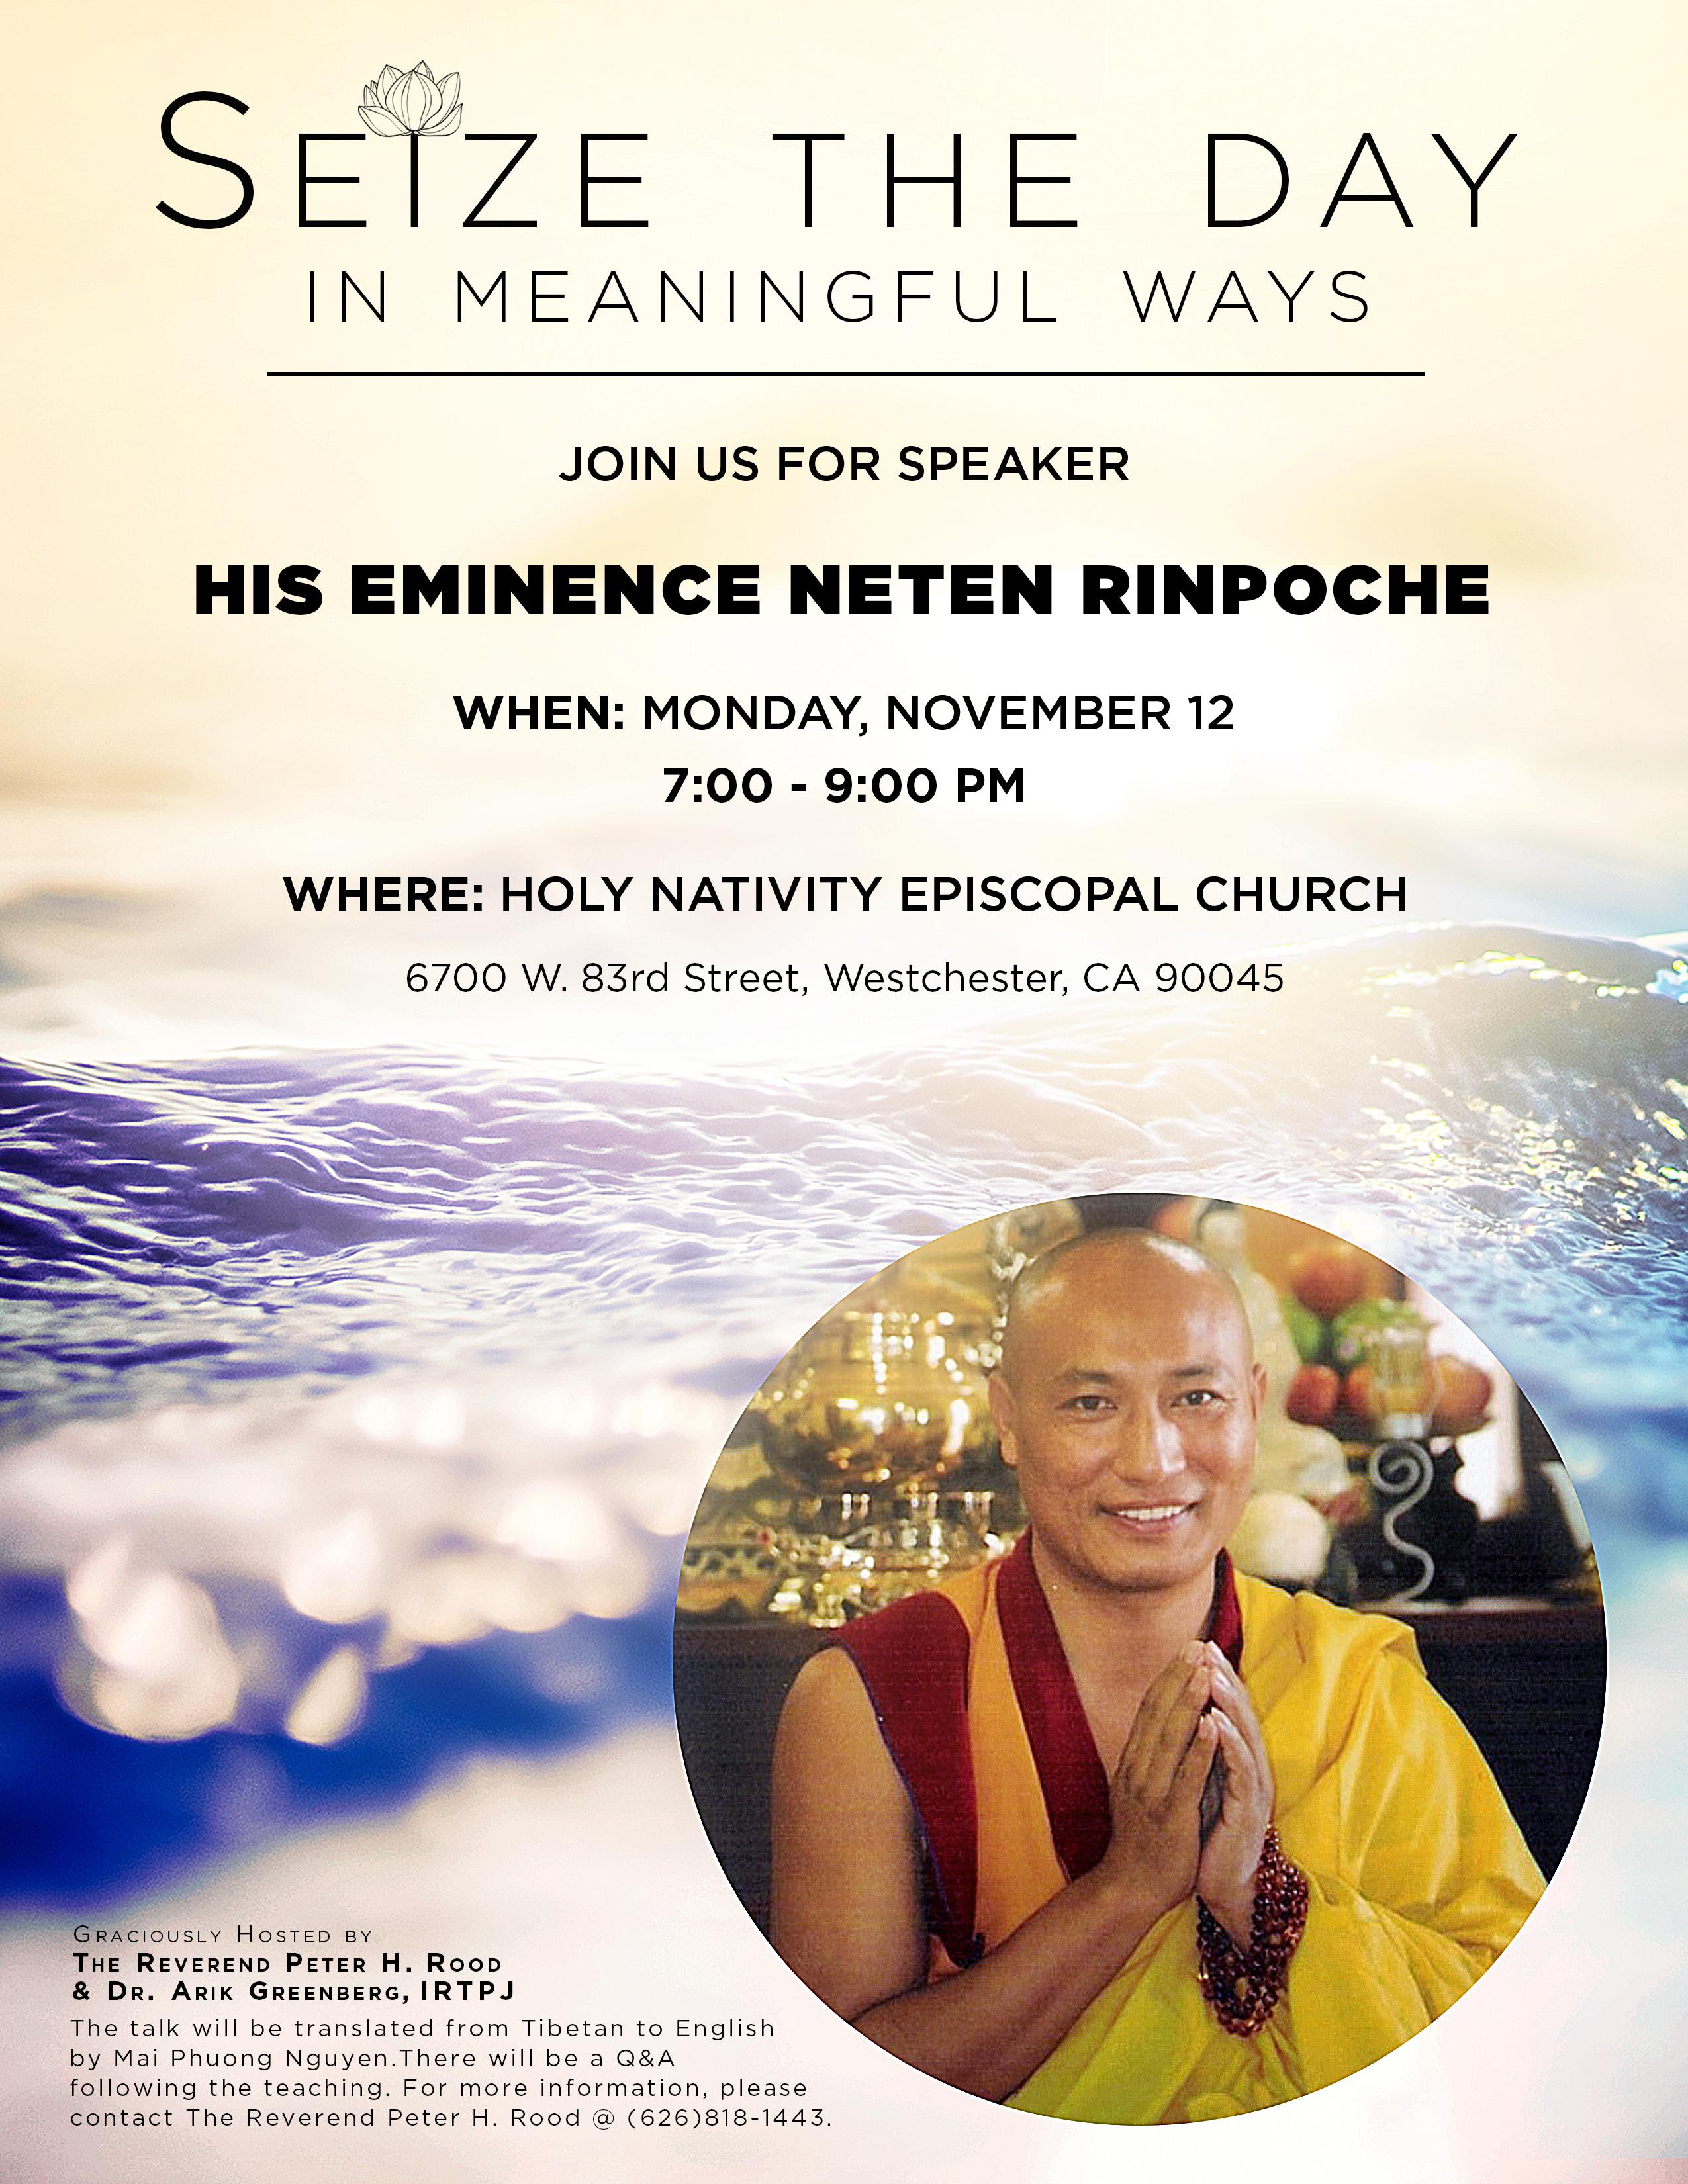 His Eminence Neten Rinpoche